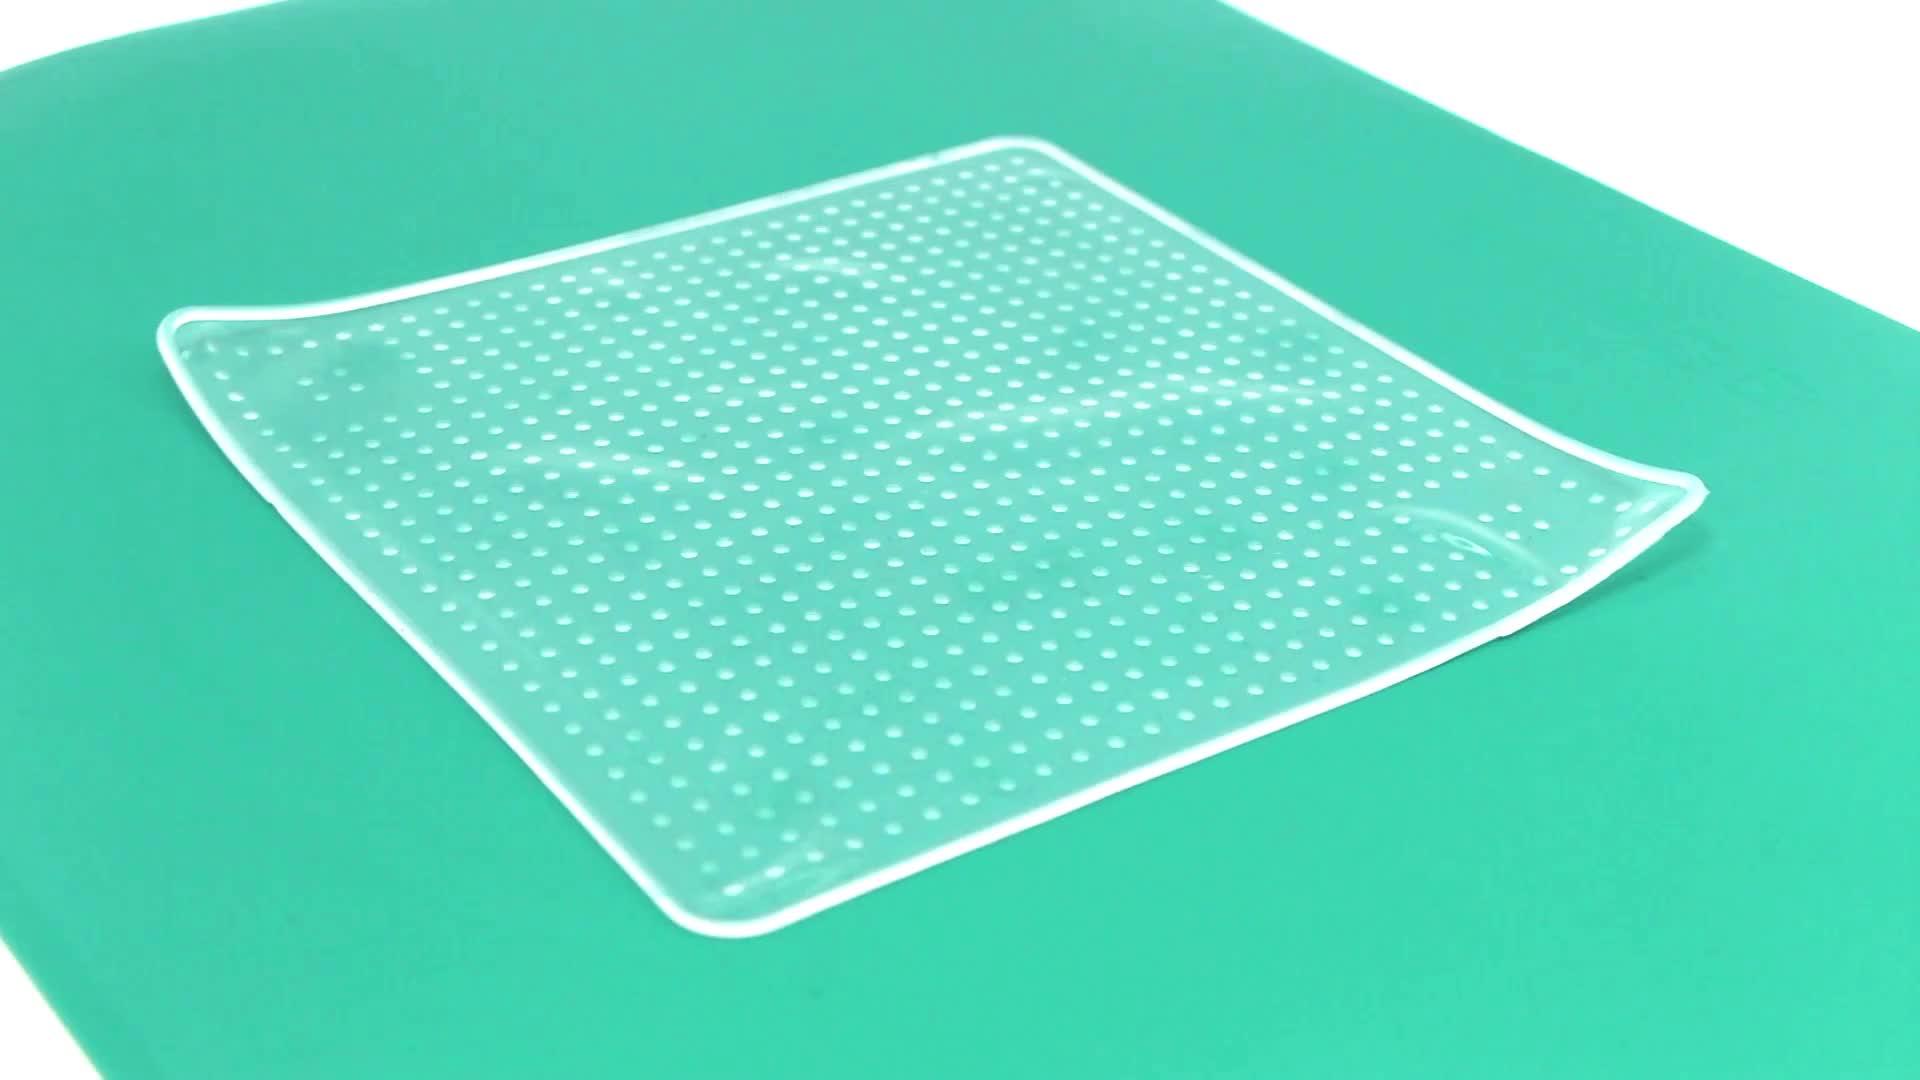 LFGB Standaard Siliconen Stretch Wrap Vershoudfolie, Voedsel Vers Houden Film, Siliconen Voedsel Wrap Stretch Film voor Voedsel